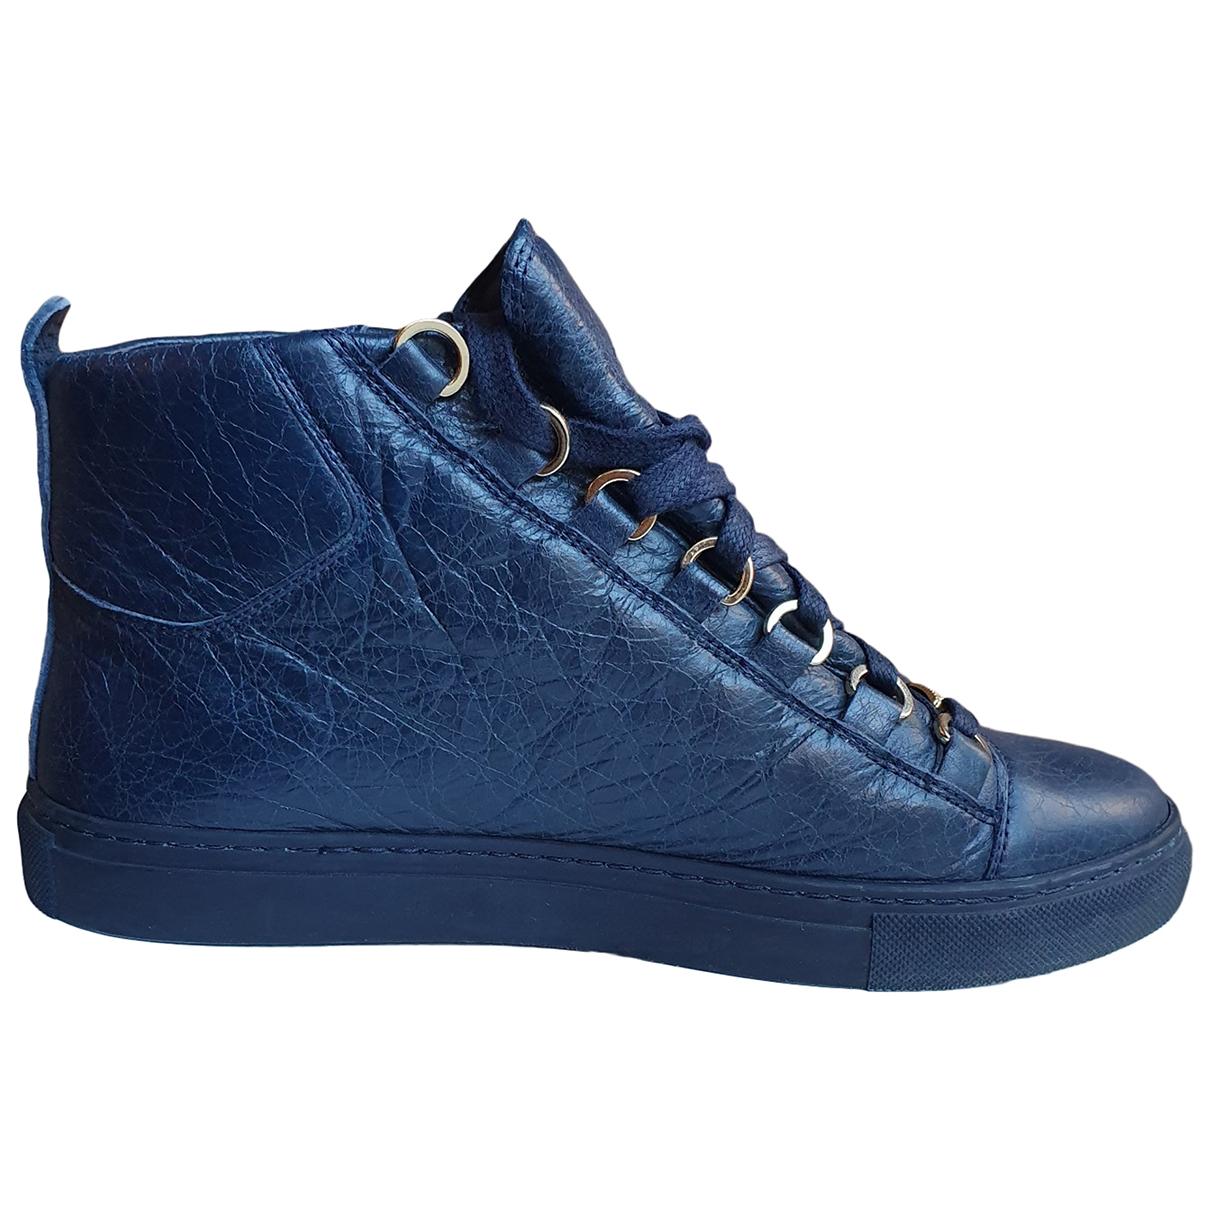 Balenciaga Arena Blue Leather Trainers for Women 38 EU